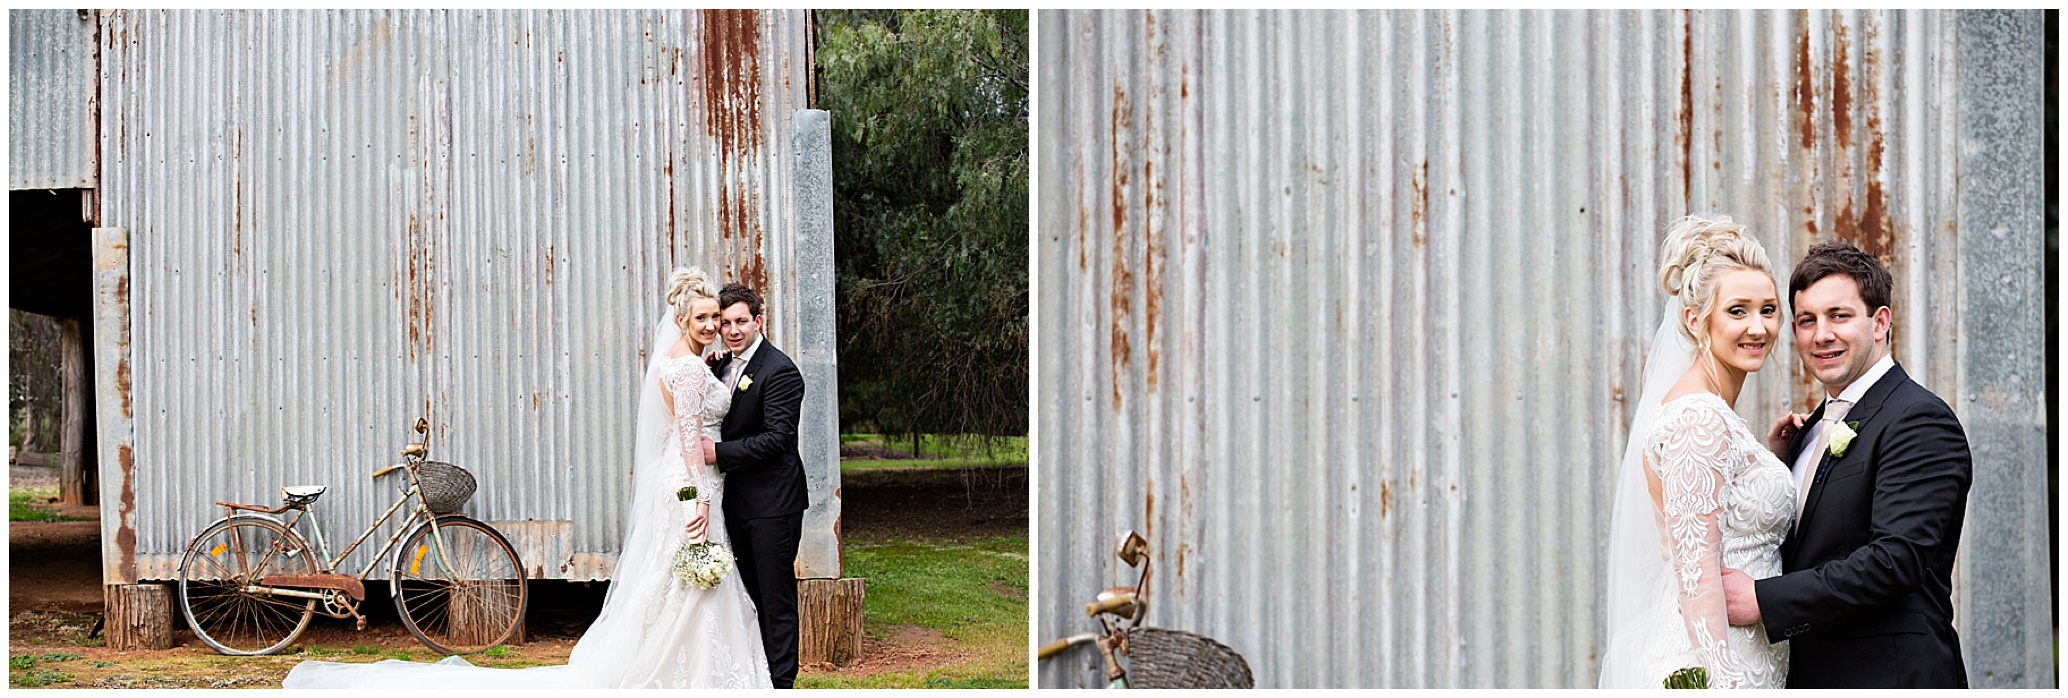 yarrawonga-wedding-photographer_0276.jpg